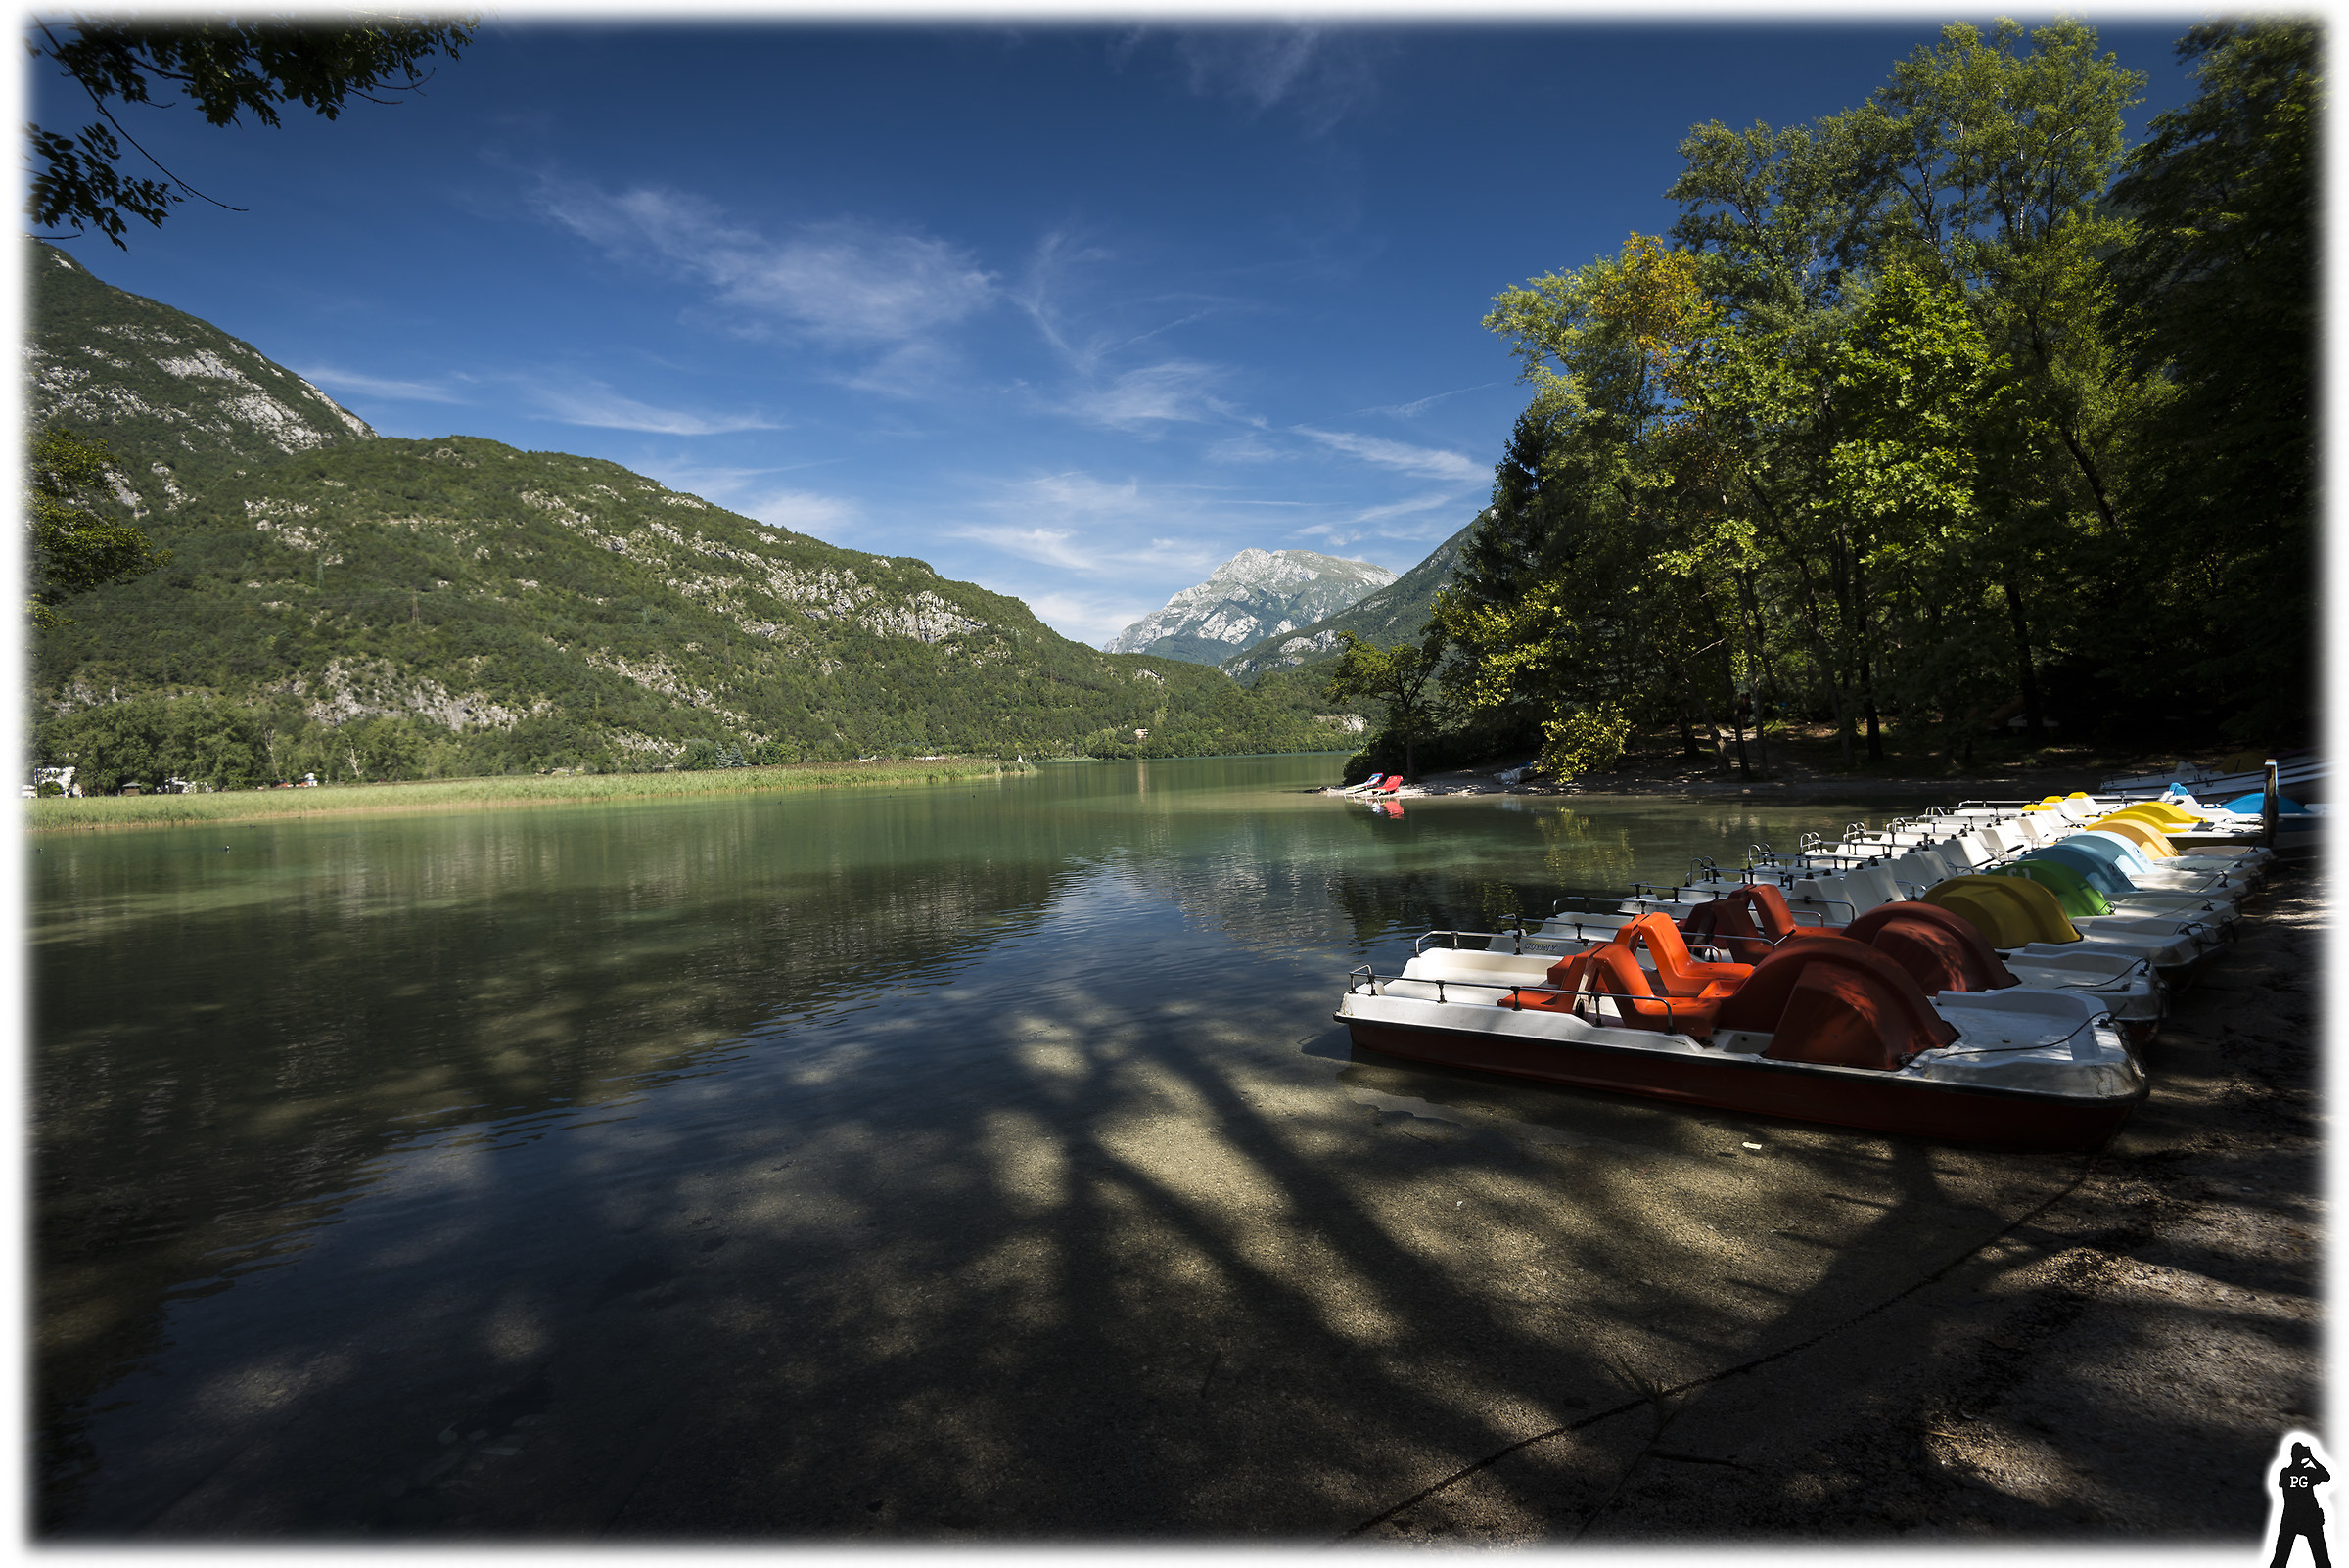 Lake Cavazzo 01 (or lake of 3 common borders or 3!)...